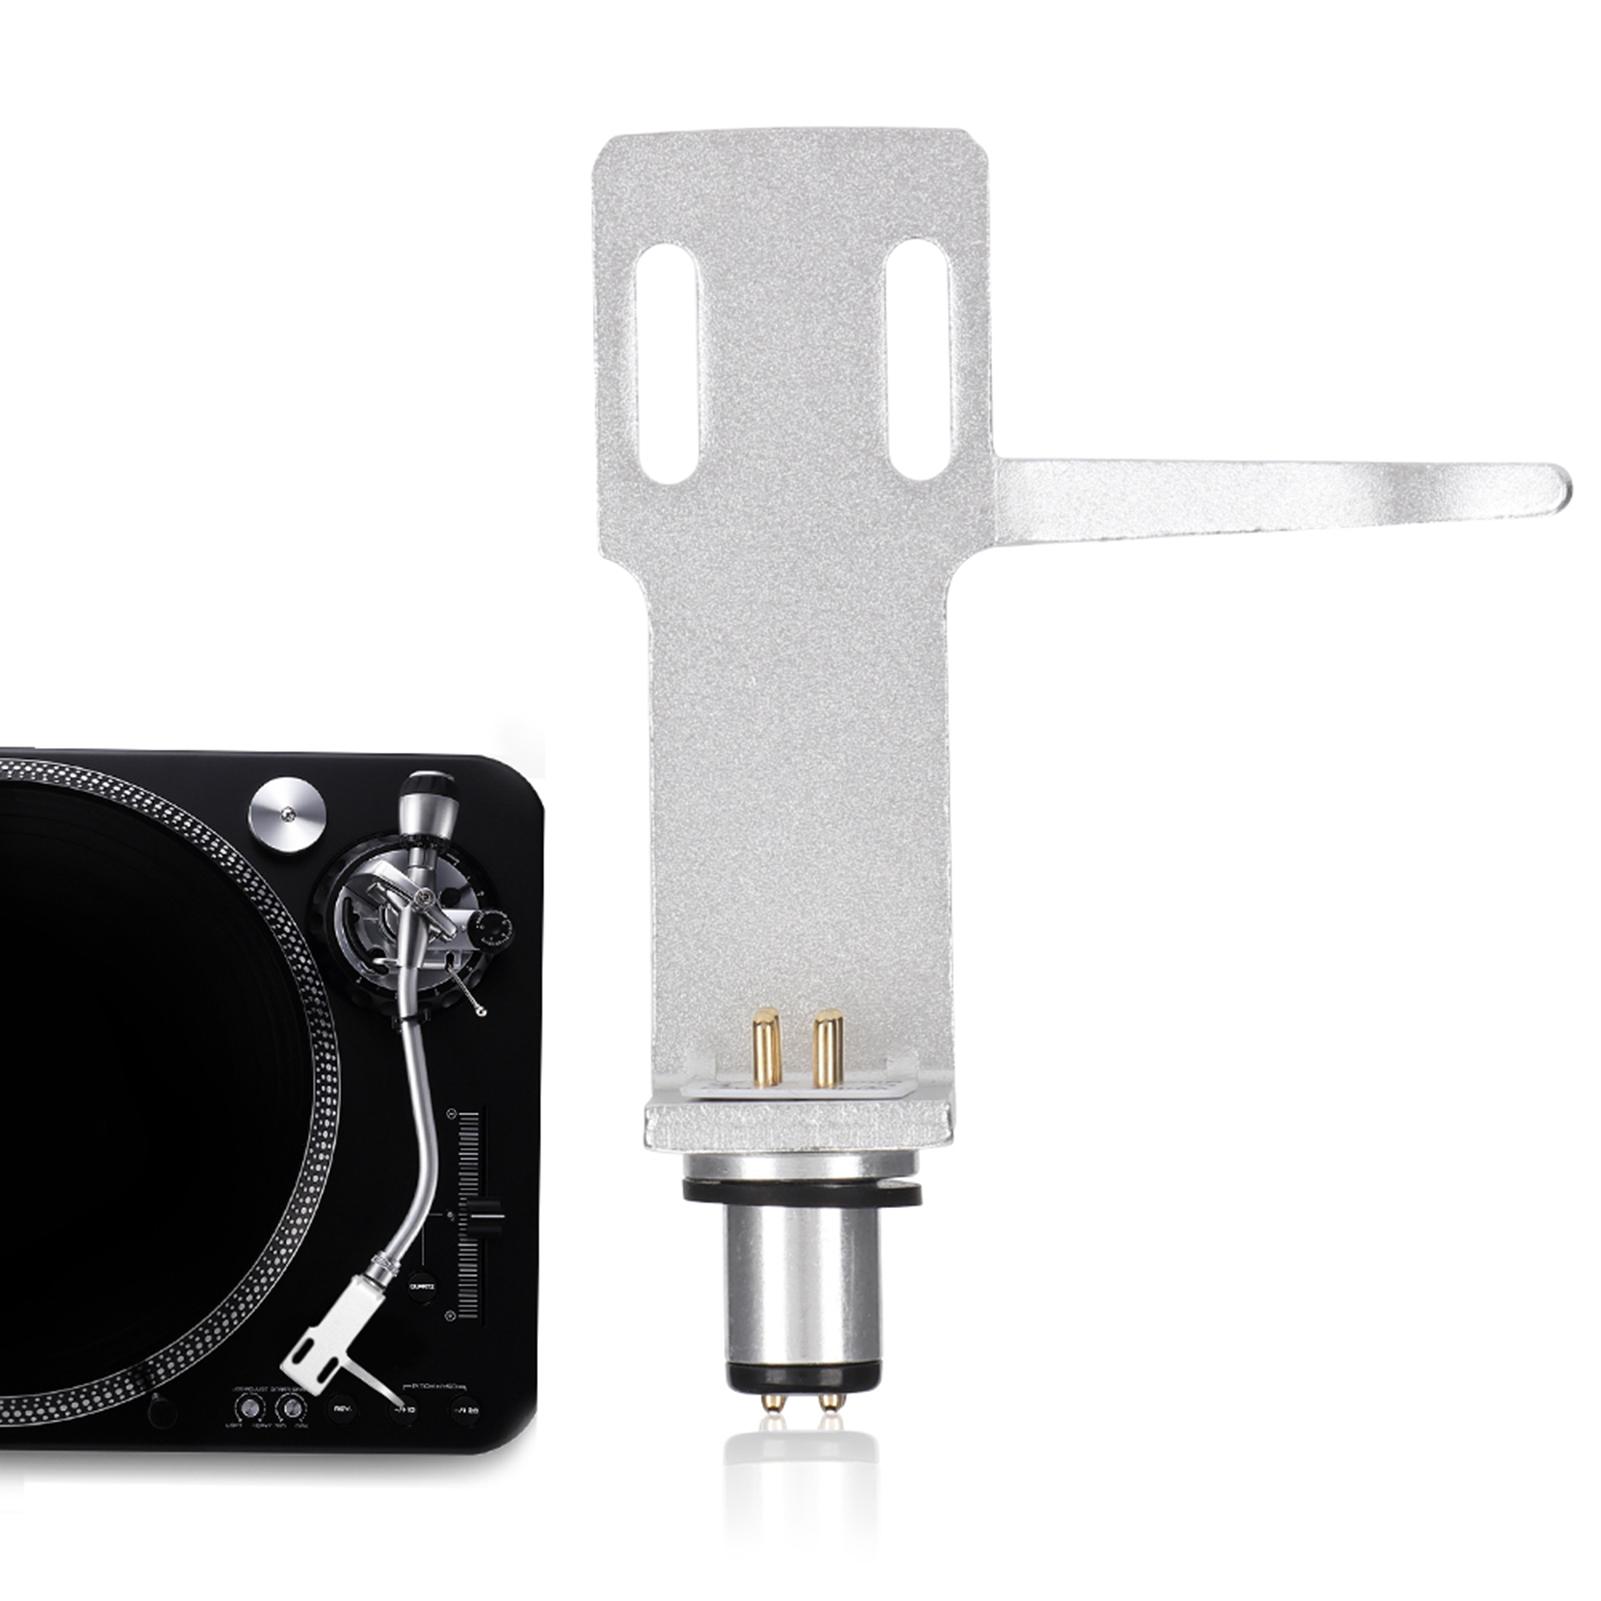 Universal-Phono-Stylus-Holder-Headshell-Cartridge-Keeper-for-LP-Record-Player thumbnail 52